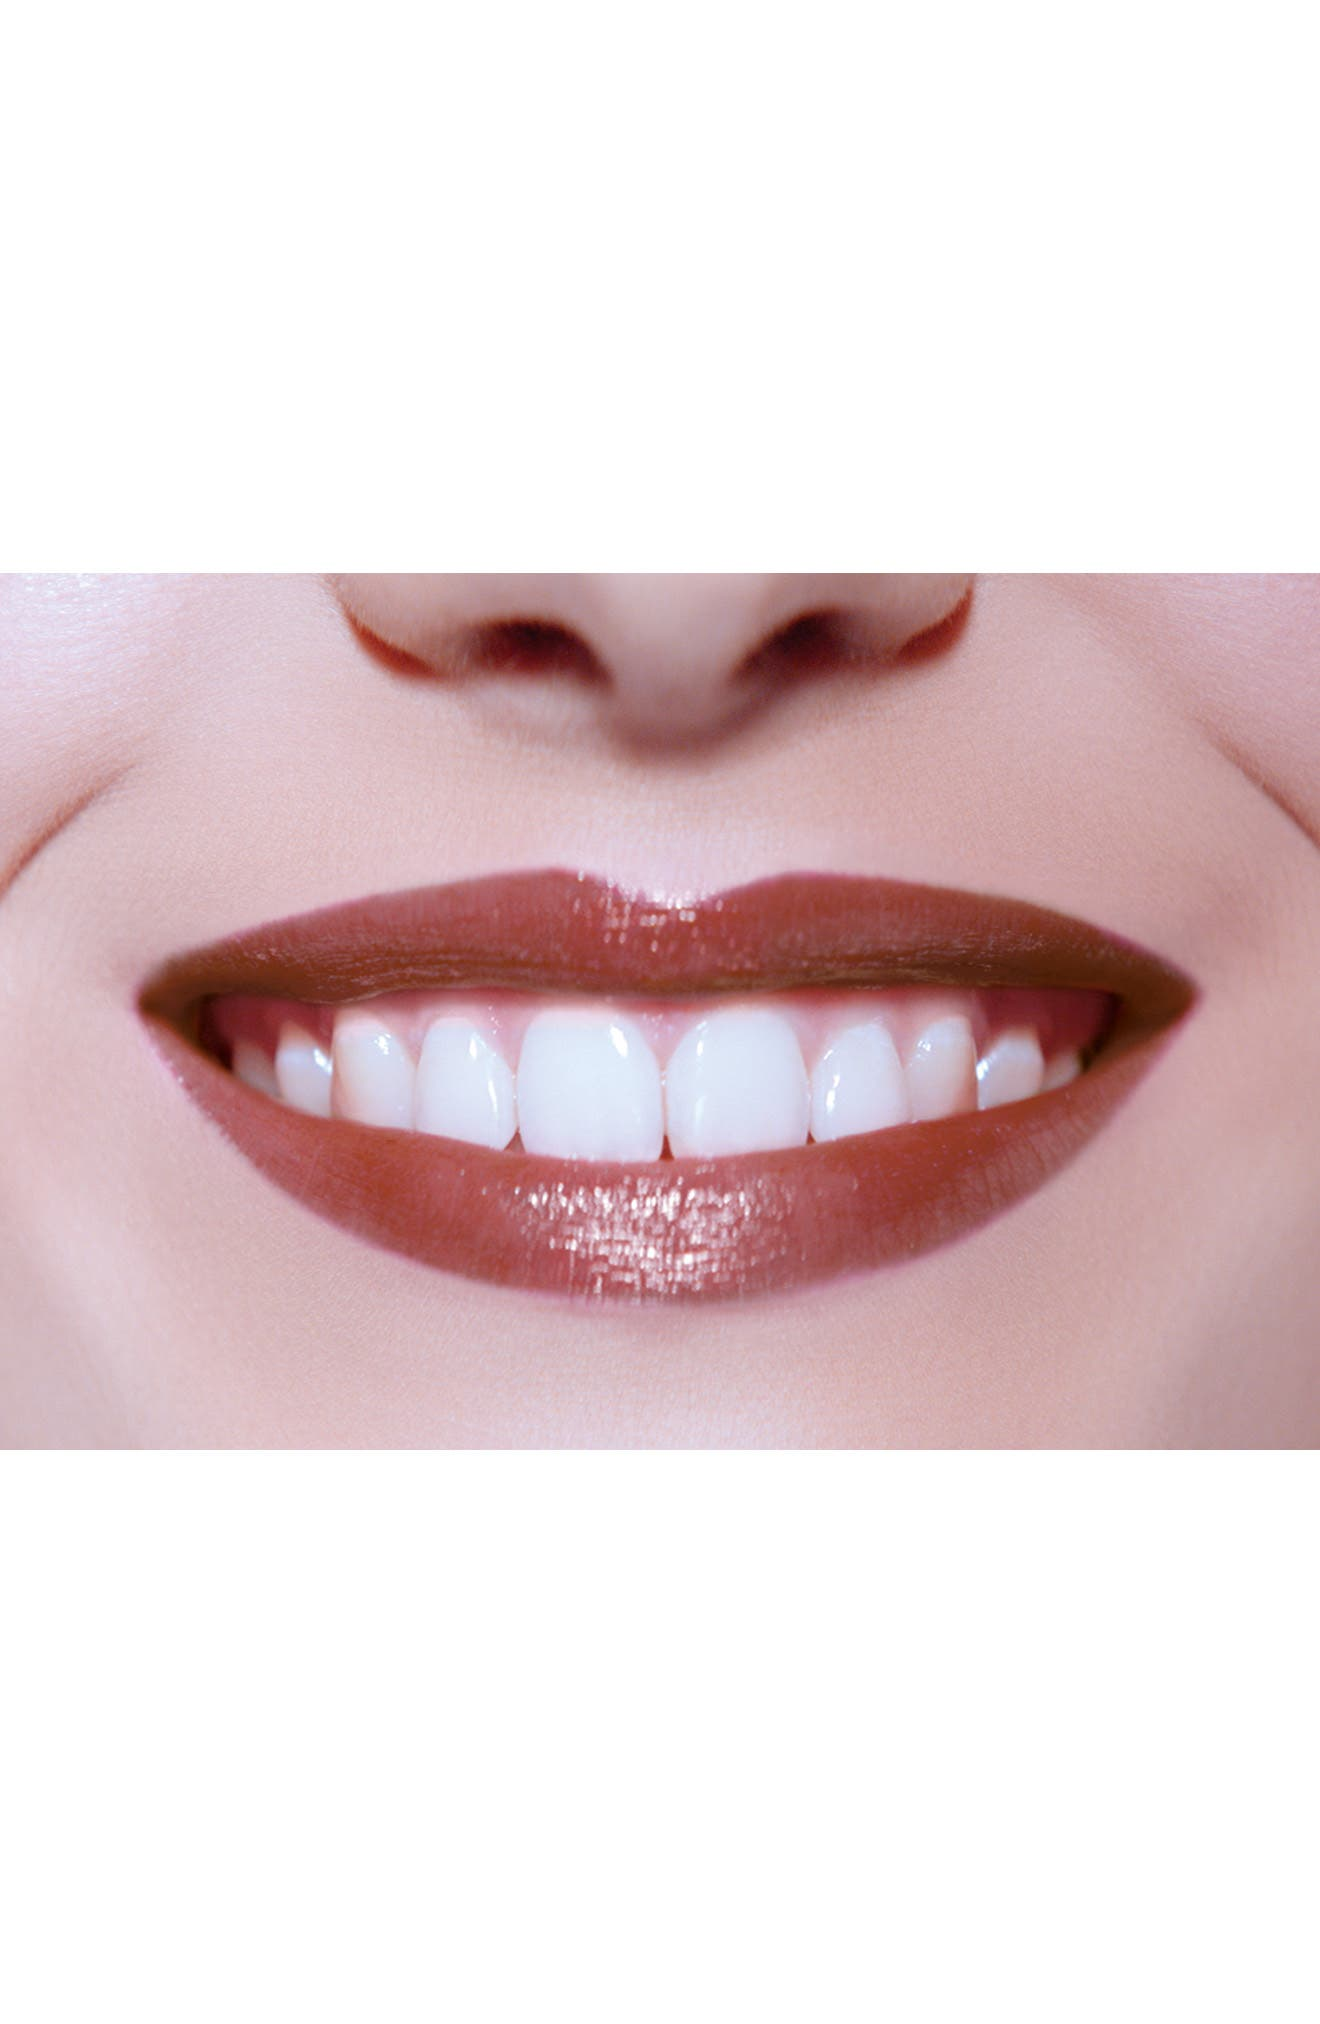 Ecstasy Shine Lipstick,                             Alternate thumbnail 2, color,                             200 SILENZIO